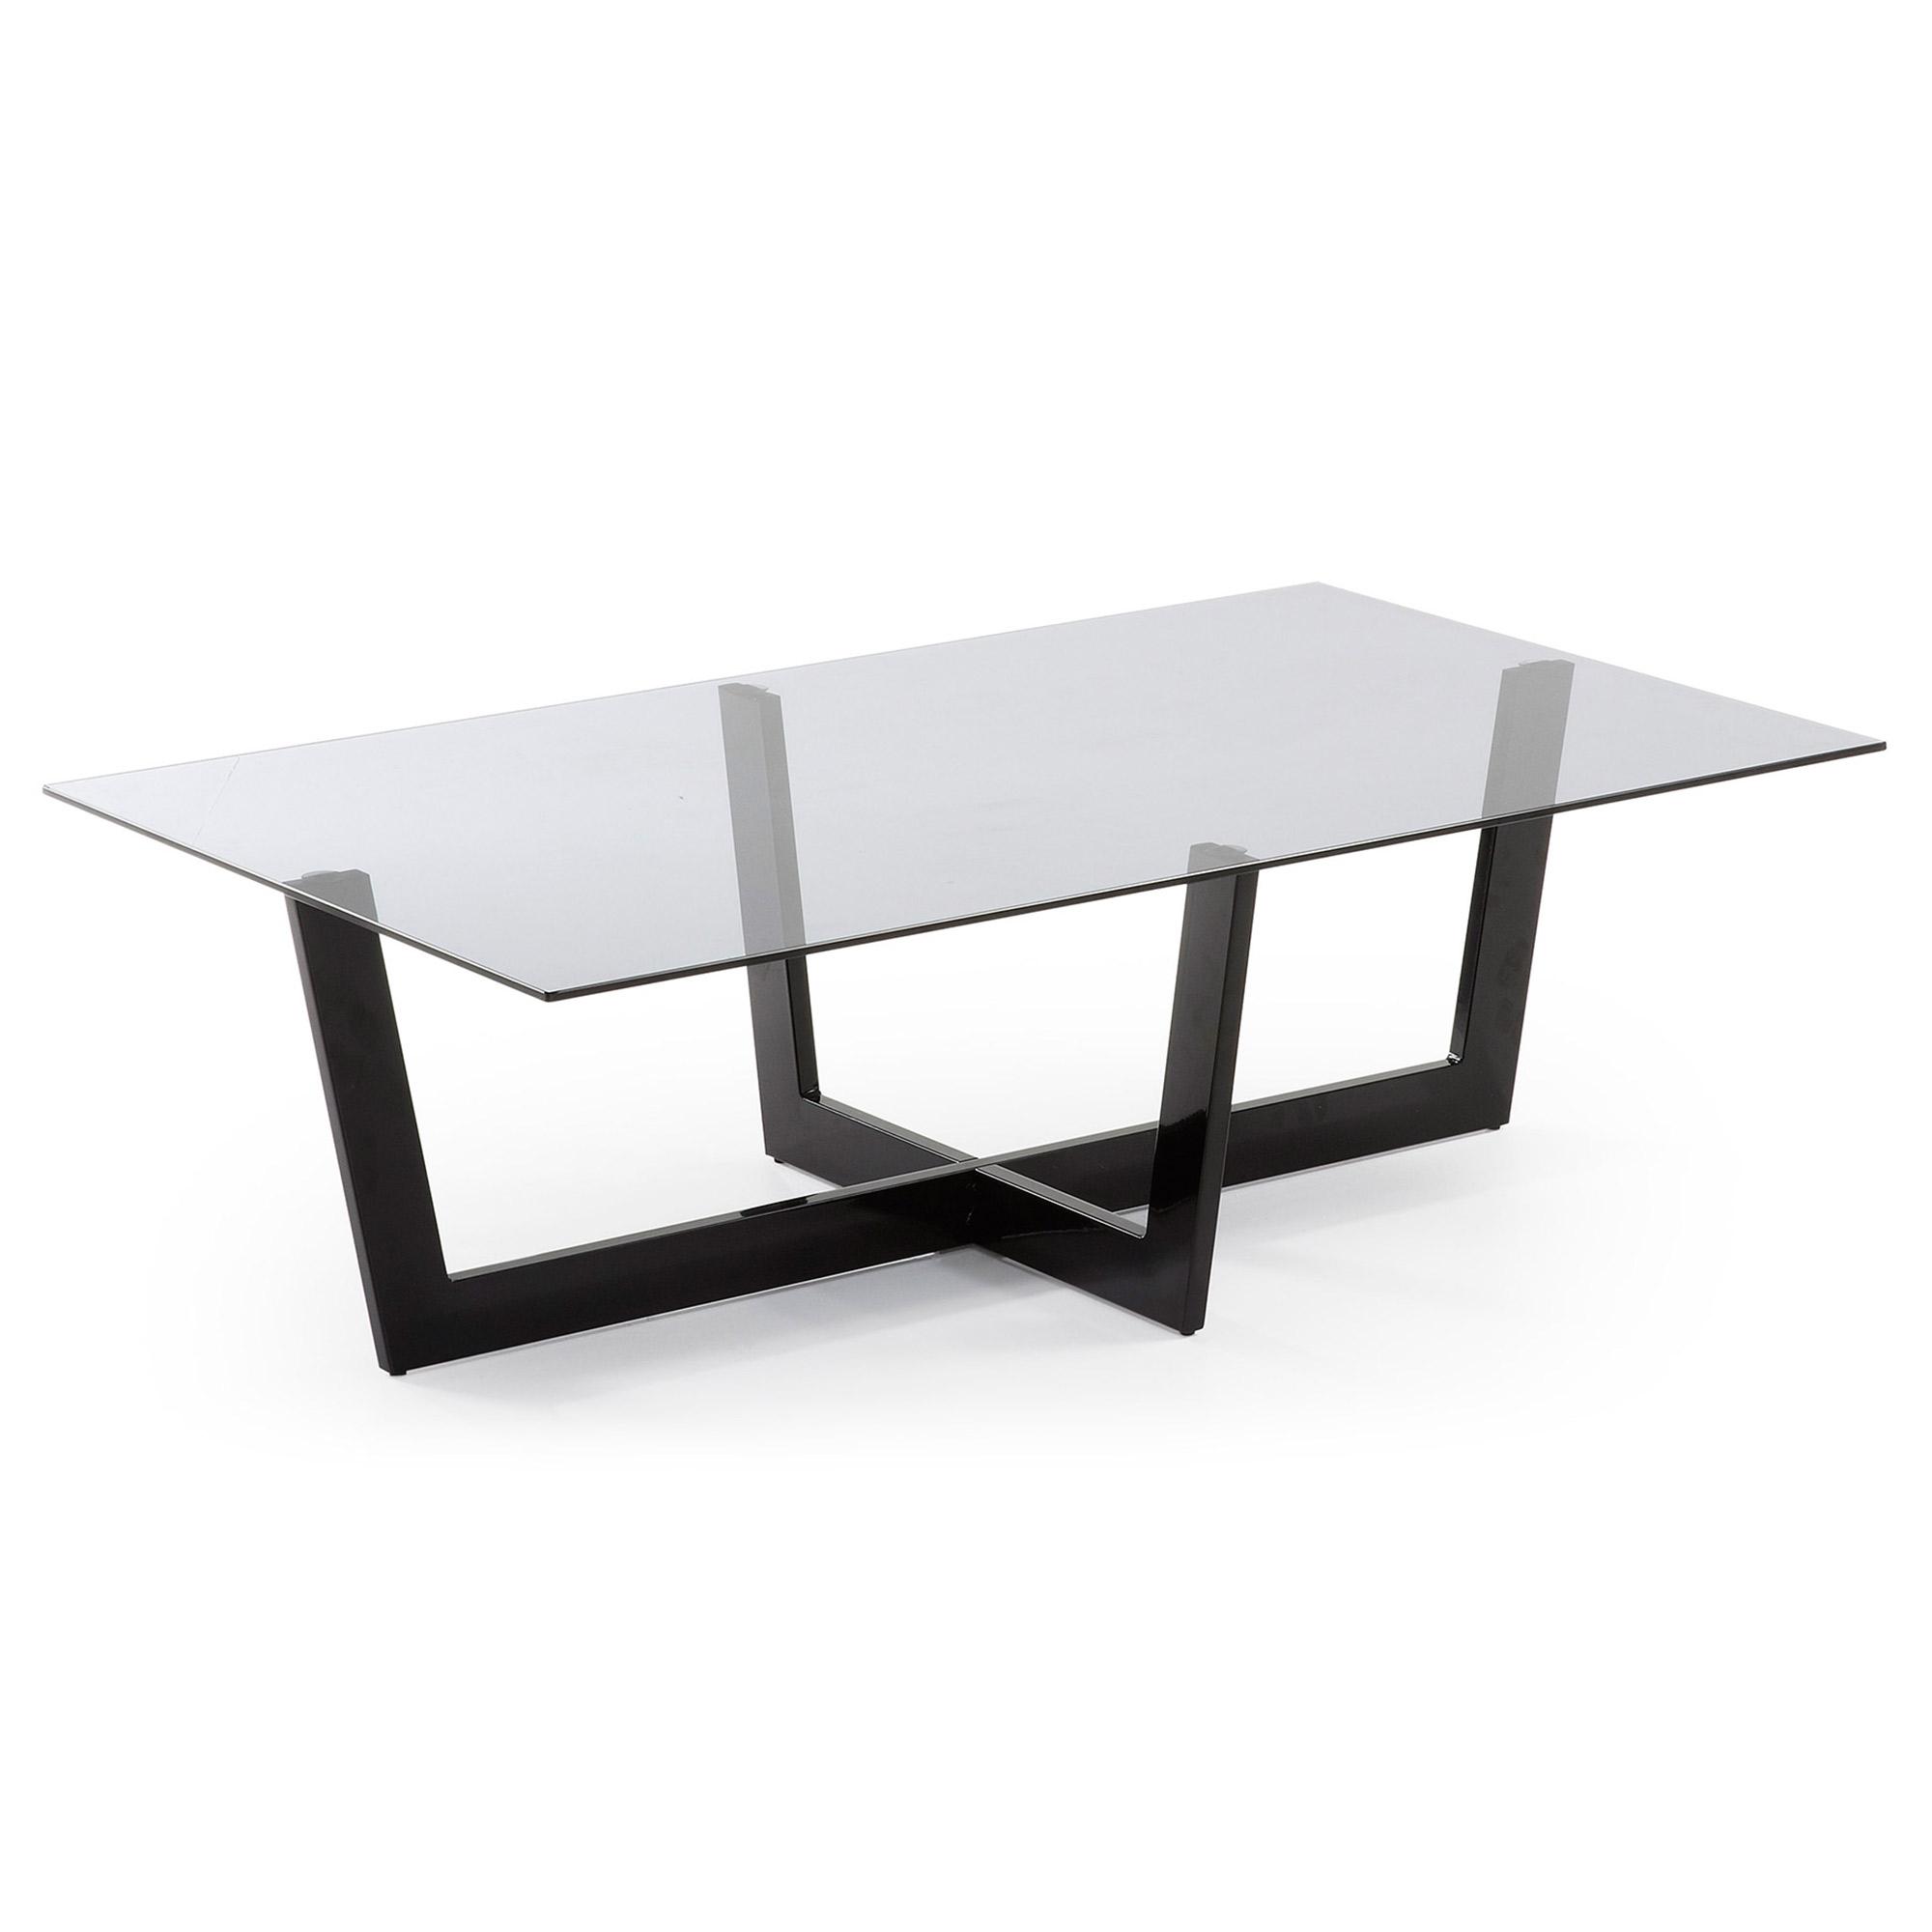 Laforma plum sofabord - grå/sort glas/stål, rektangulær (120x70) fra laforma på boboonline.dk